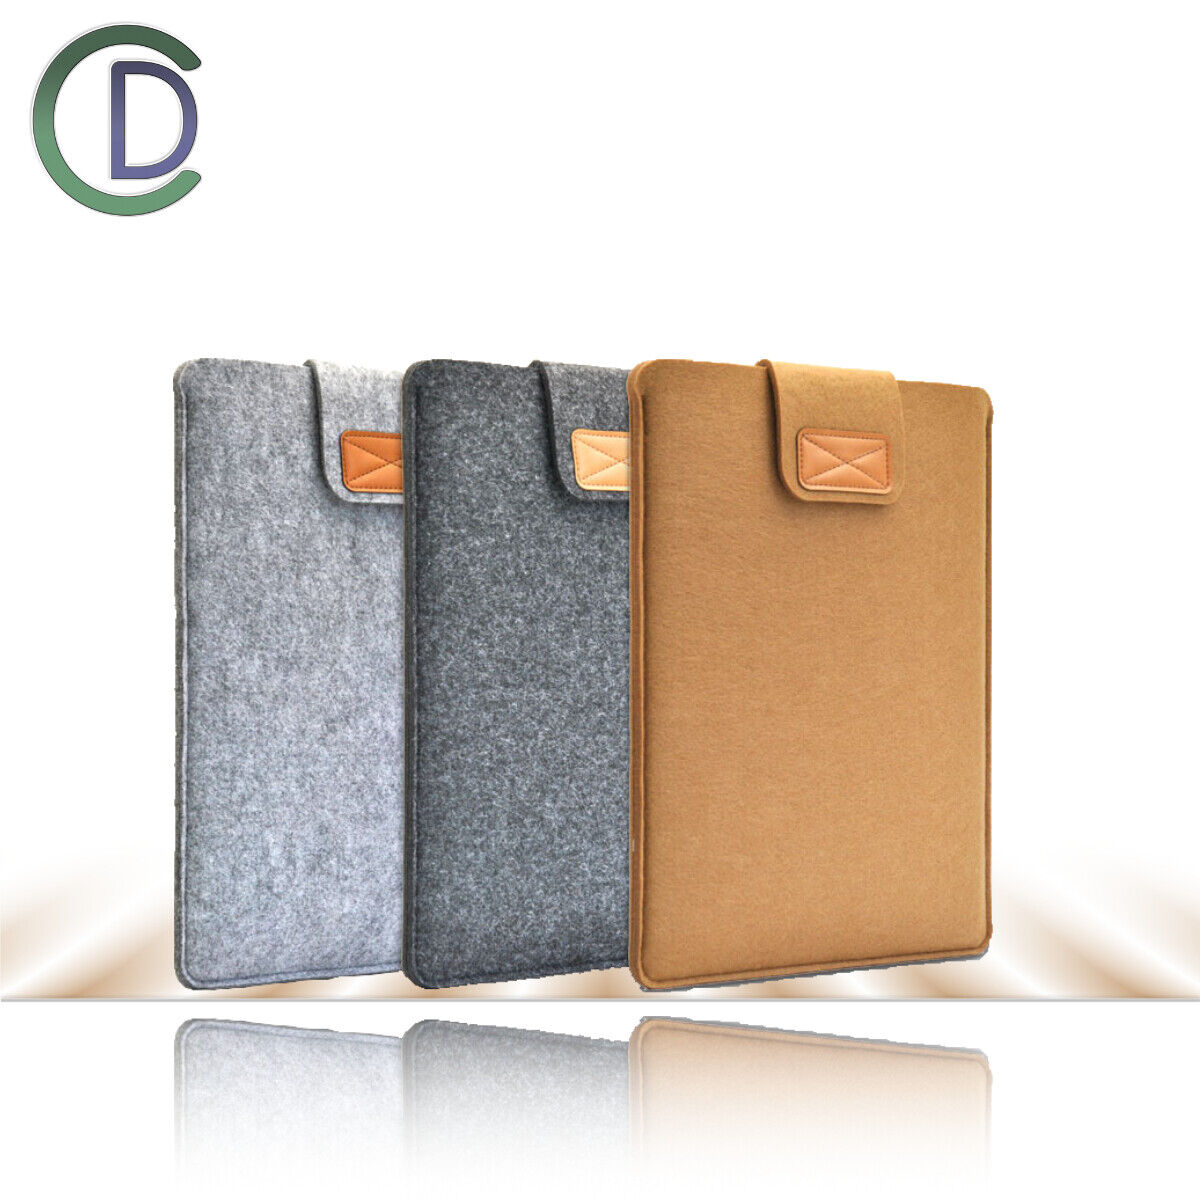 13,3 15 Zoll Laptop-Tasche Avory Filz Sleeve Hülle Kompatibel MacBook Air / Pro